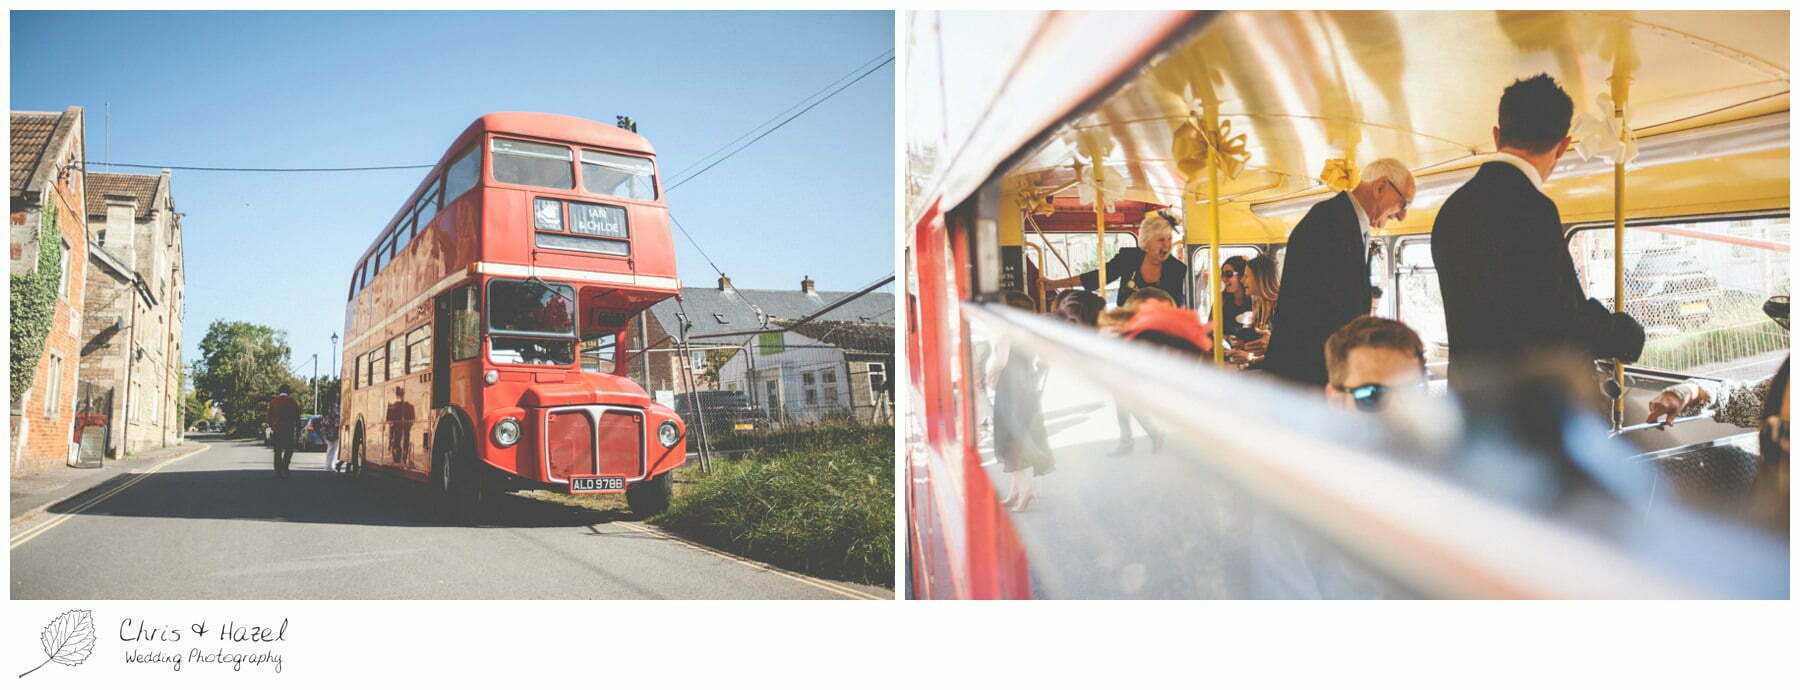 Wedding Bus, Retro Wedding Bus, London style Wedding Bus, The Glove Factory Wedding Photography, Wiltshire Wedding Photographer Trowbridge, Chris and Hazel Wedding Photography